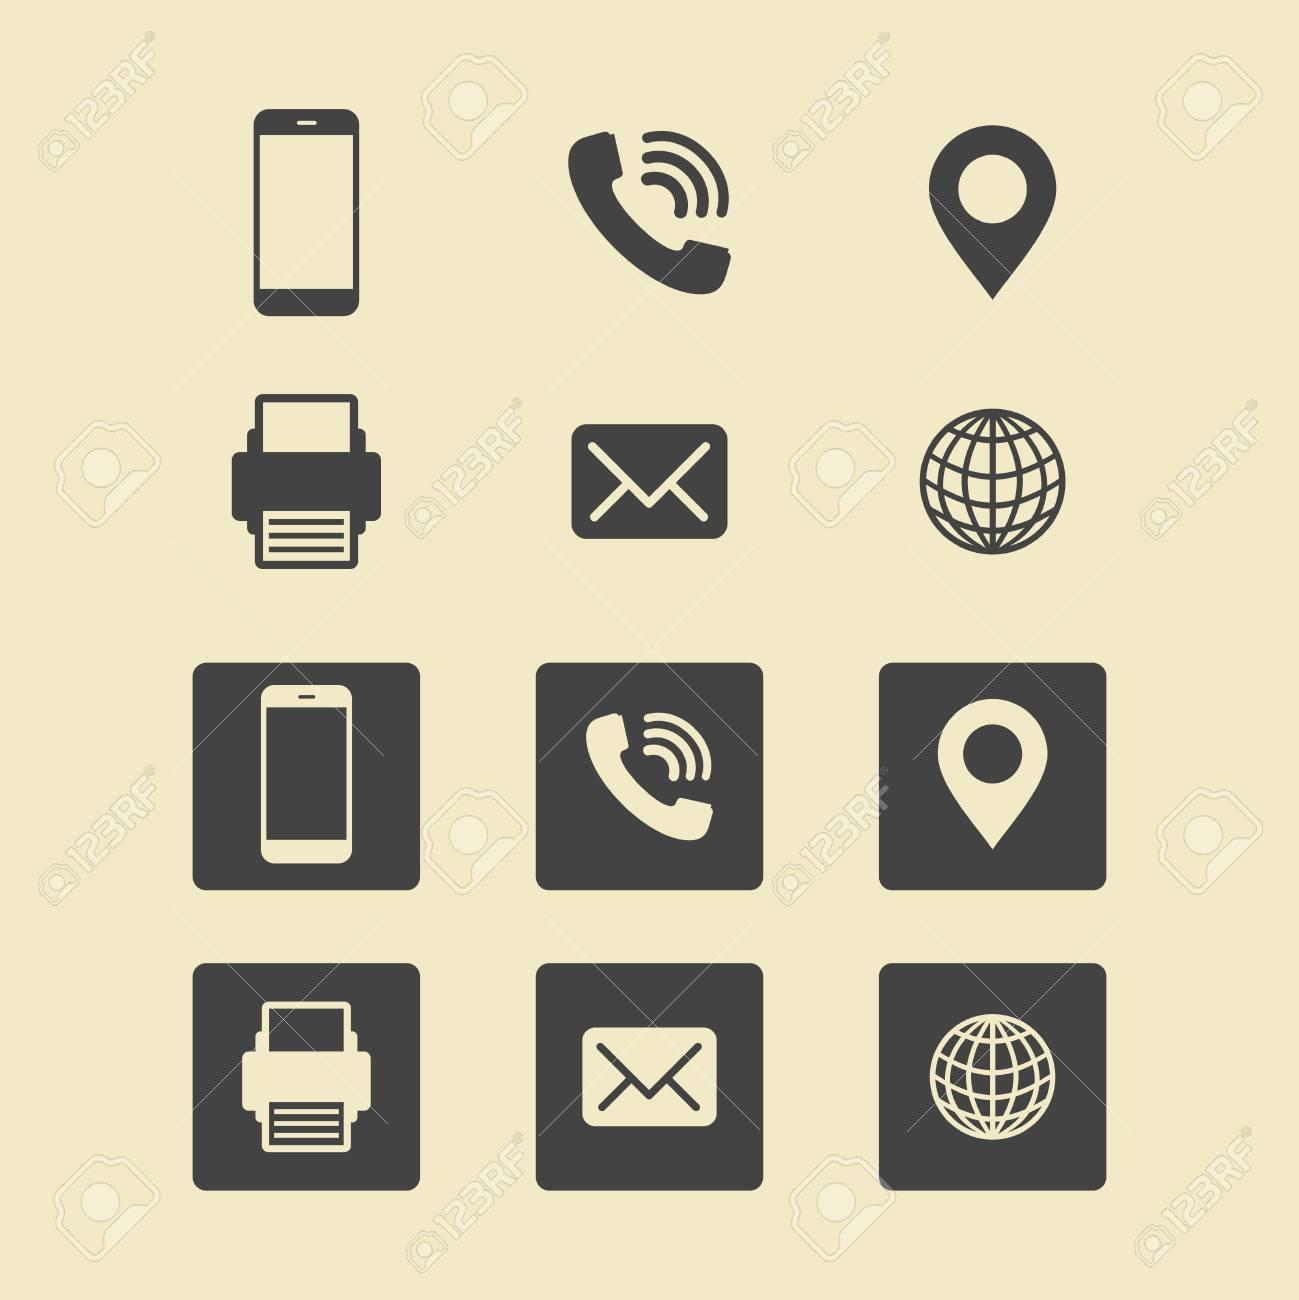 Business card icon set web icons royalty free cliparts vetores e banco de imagens business card icon set web icons reheart Images